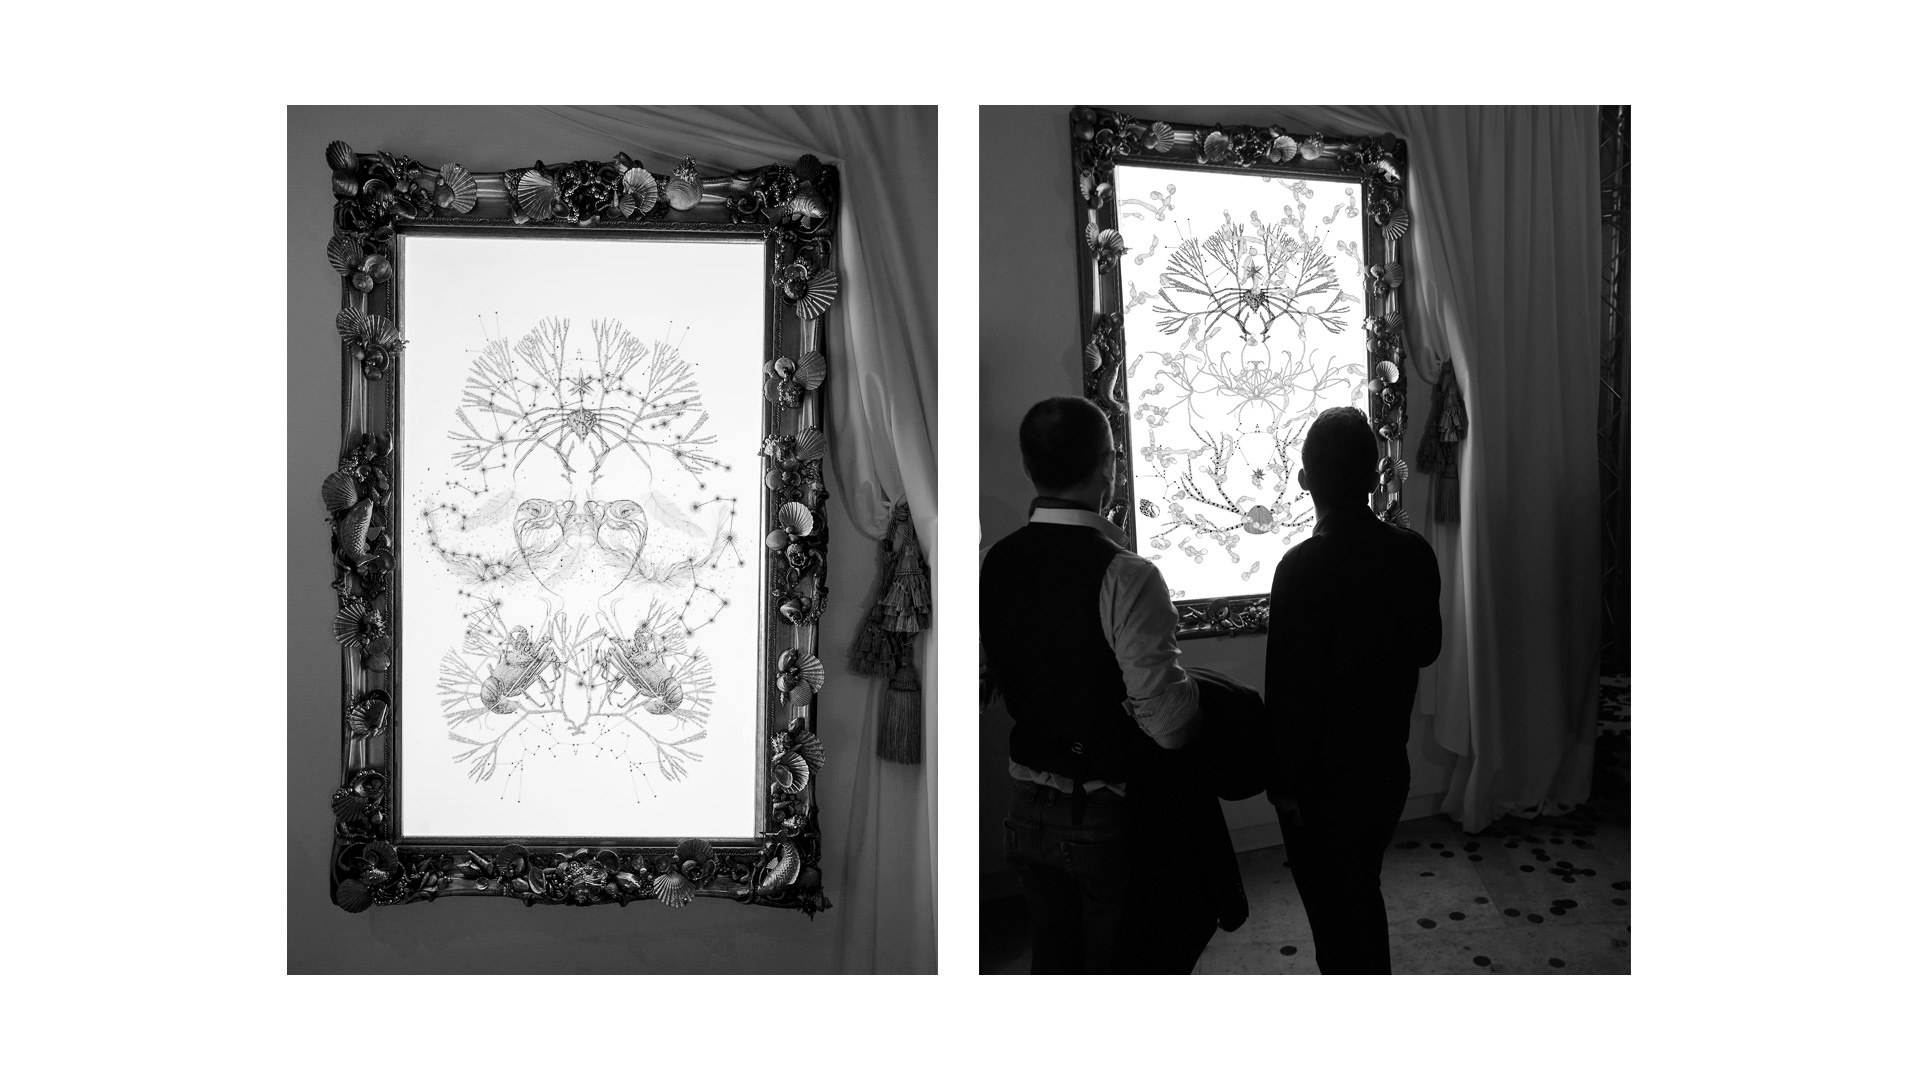 3-inoui-paris-creative-digital-print-installation-art-palais-de-tokyo